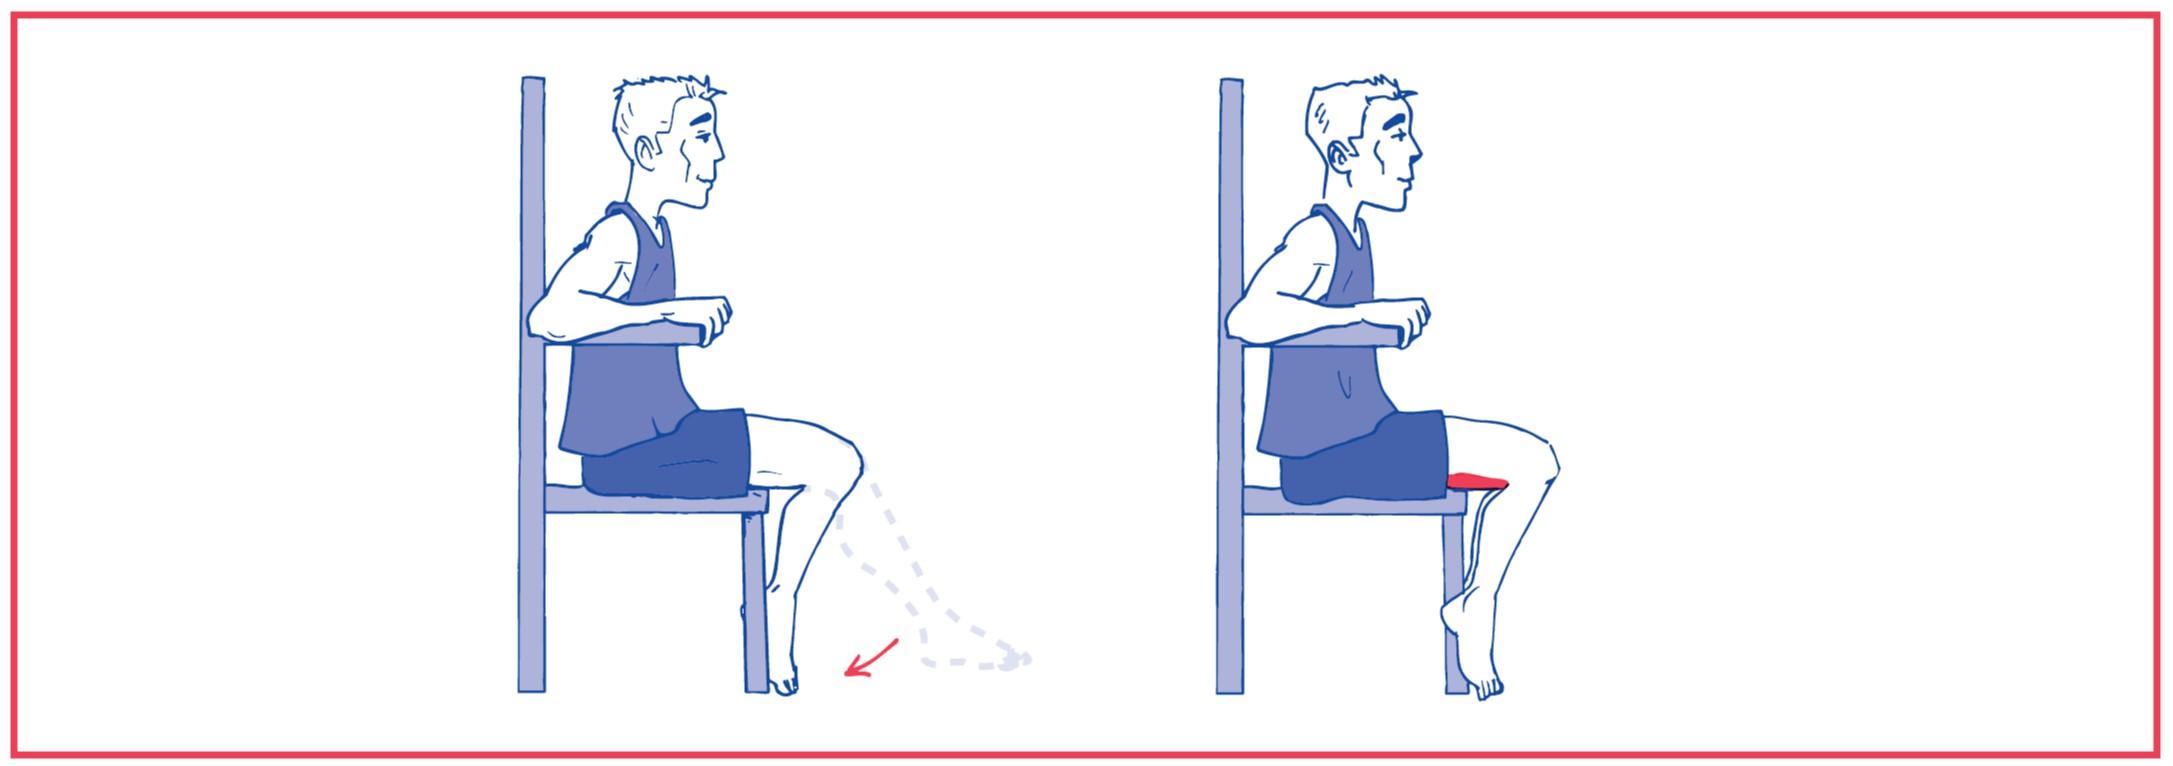 1. Free knee flexion